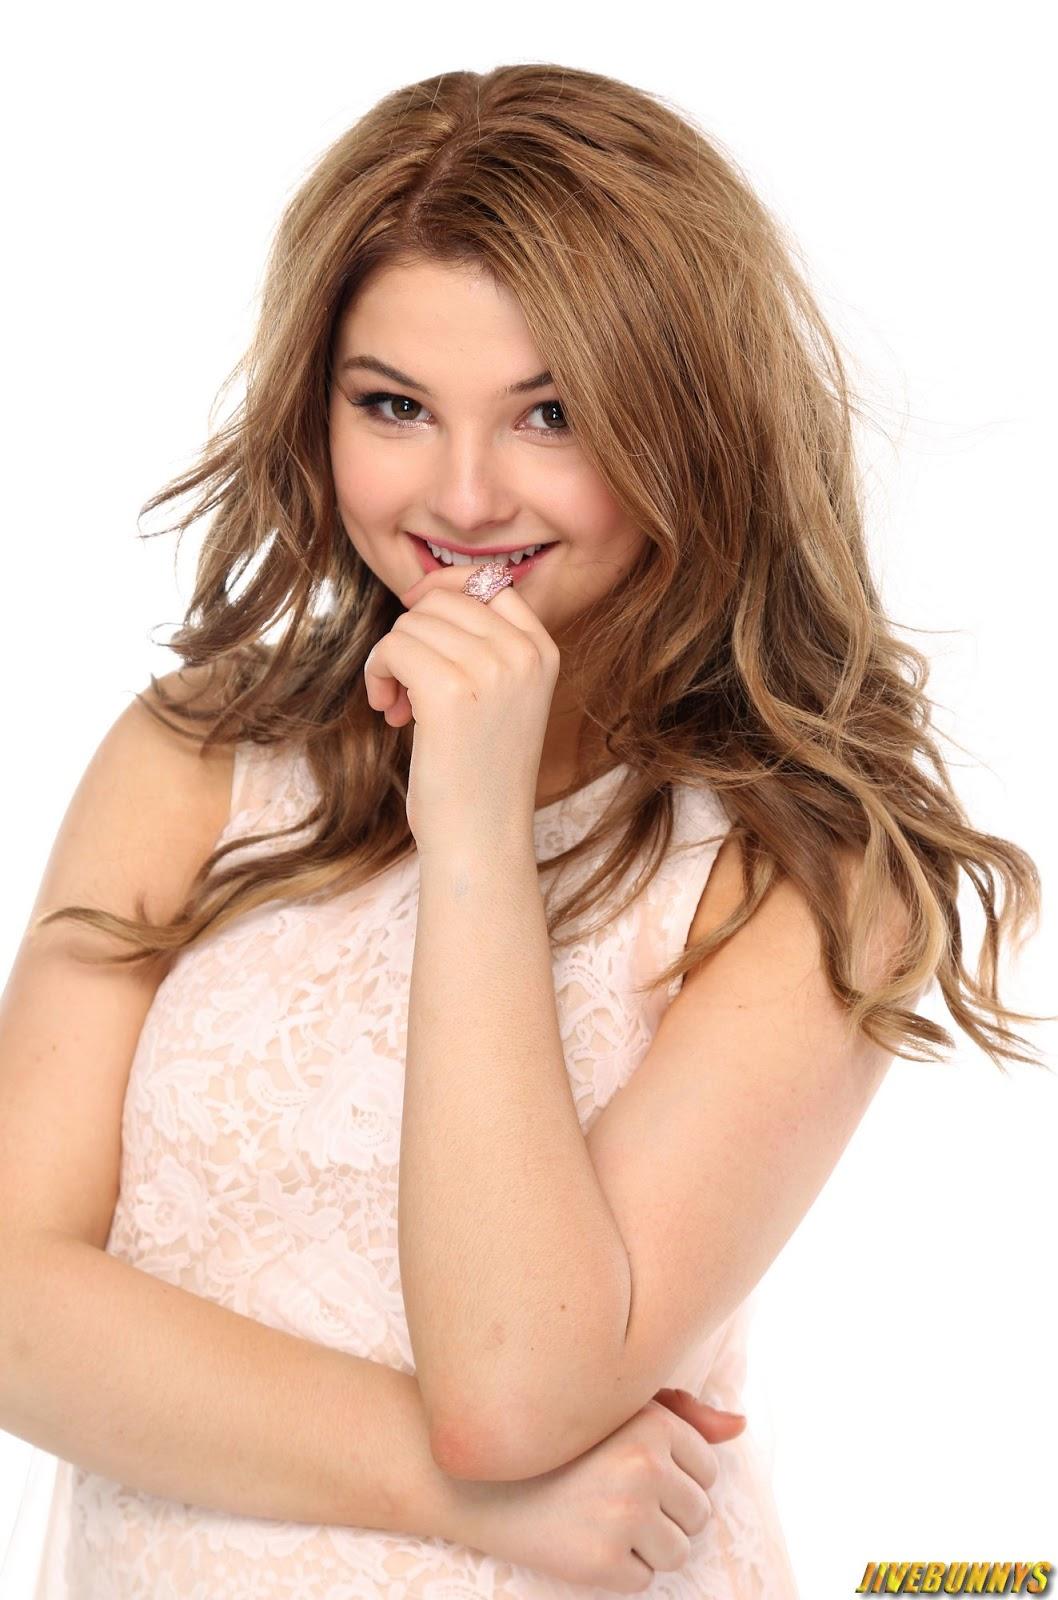 stefanie scott sexy young actress photos gallery 4